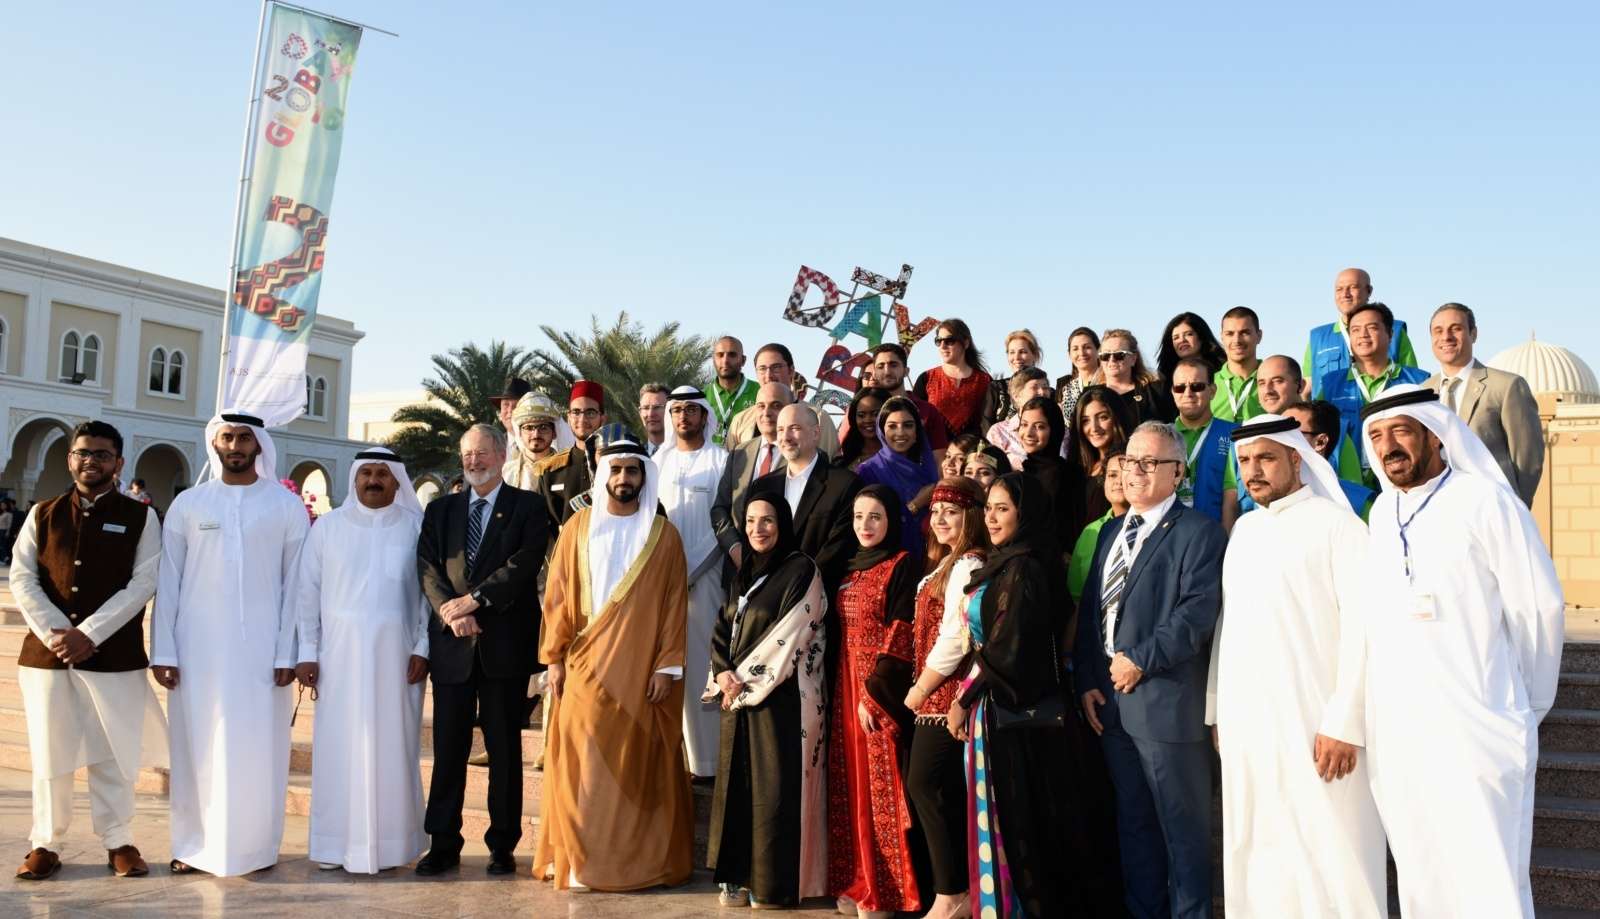 American_University_of_Sharjah_6.jpg